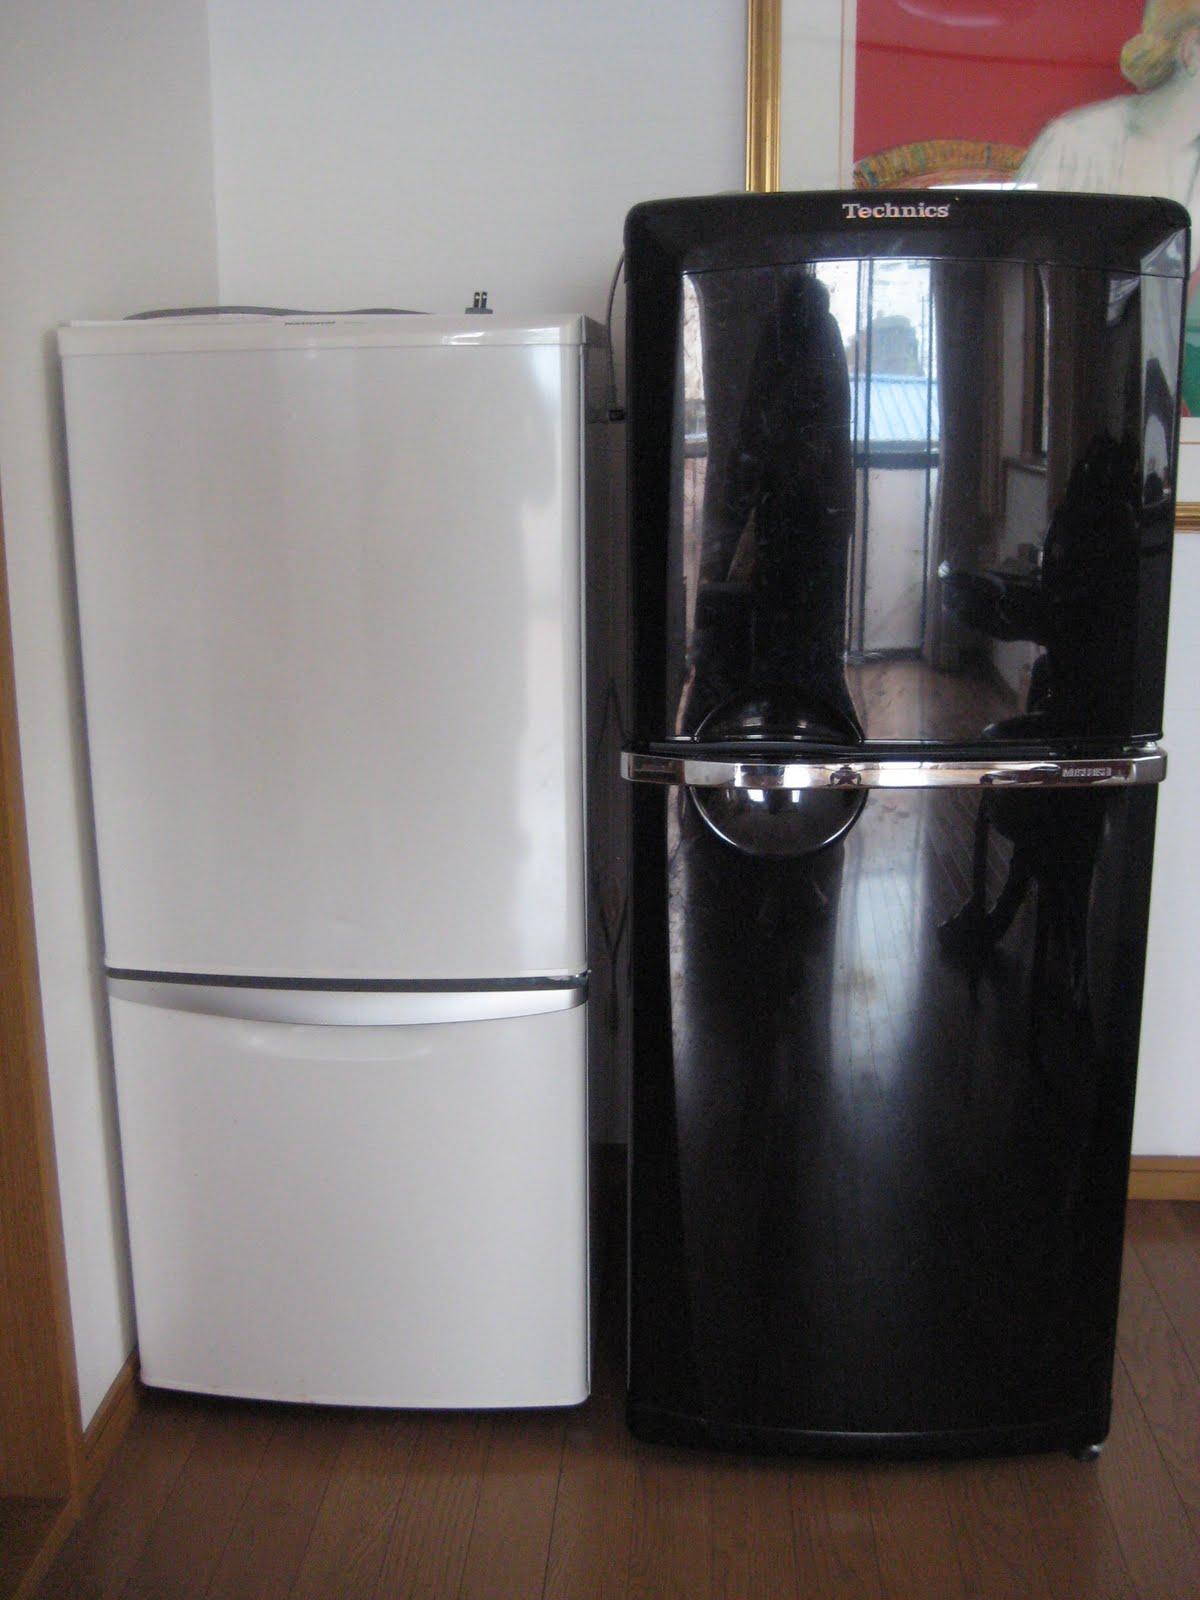 Appliance Sale Gotanda Area Black Mitsubishi Fridge 5